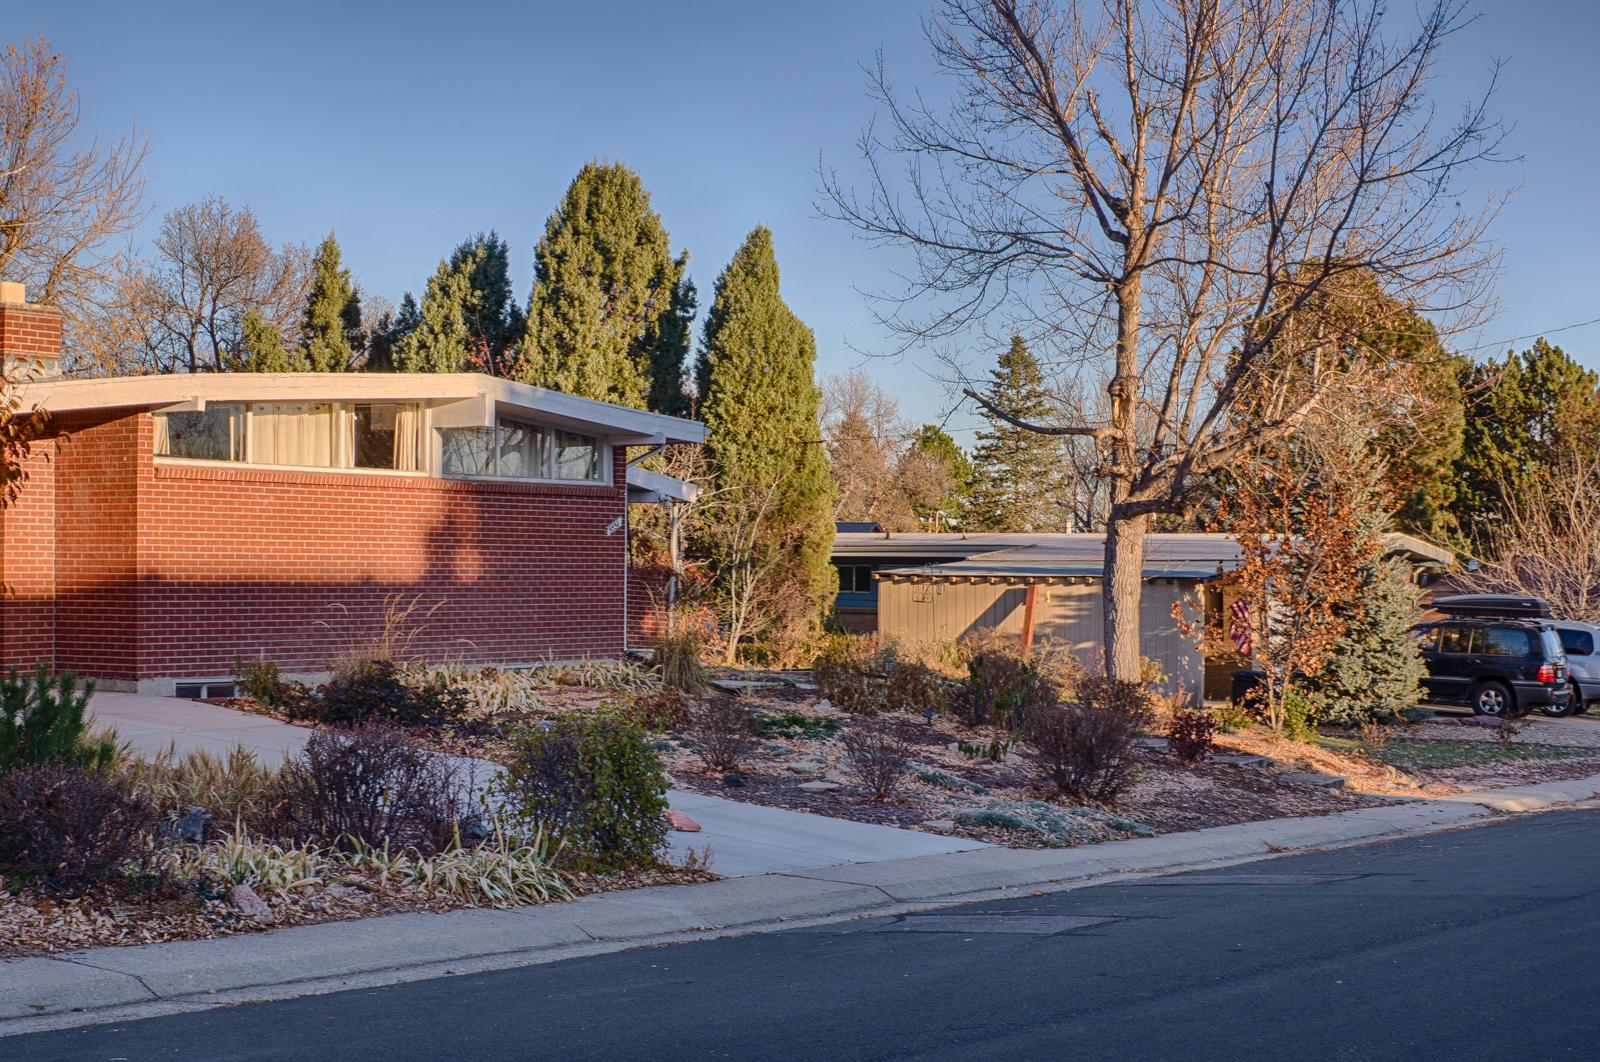 Adrian-Kinney-Dream-House-Acres-5.jpg